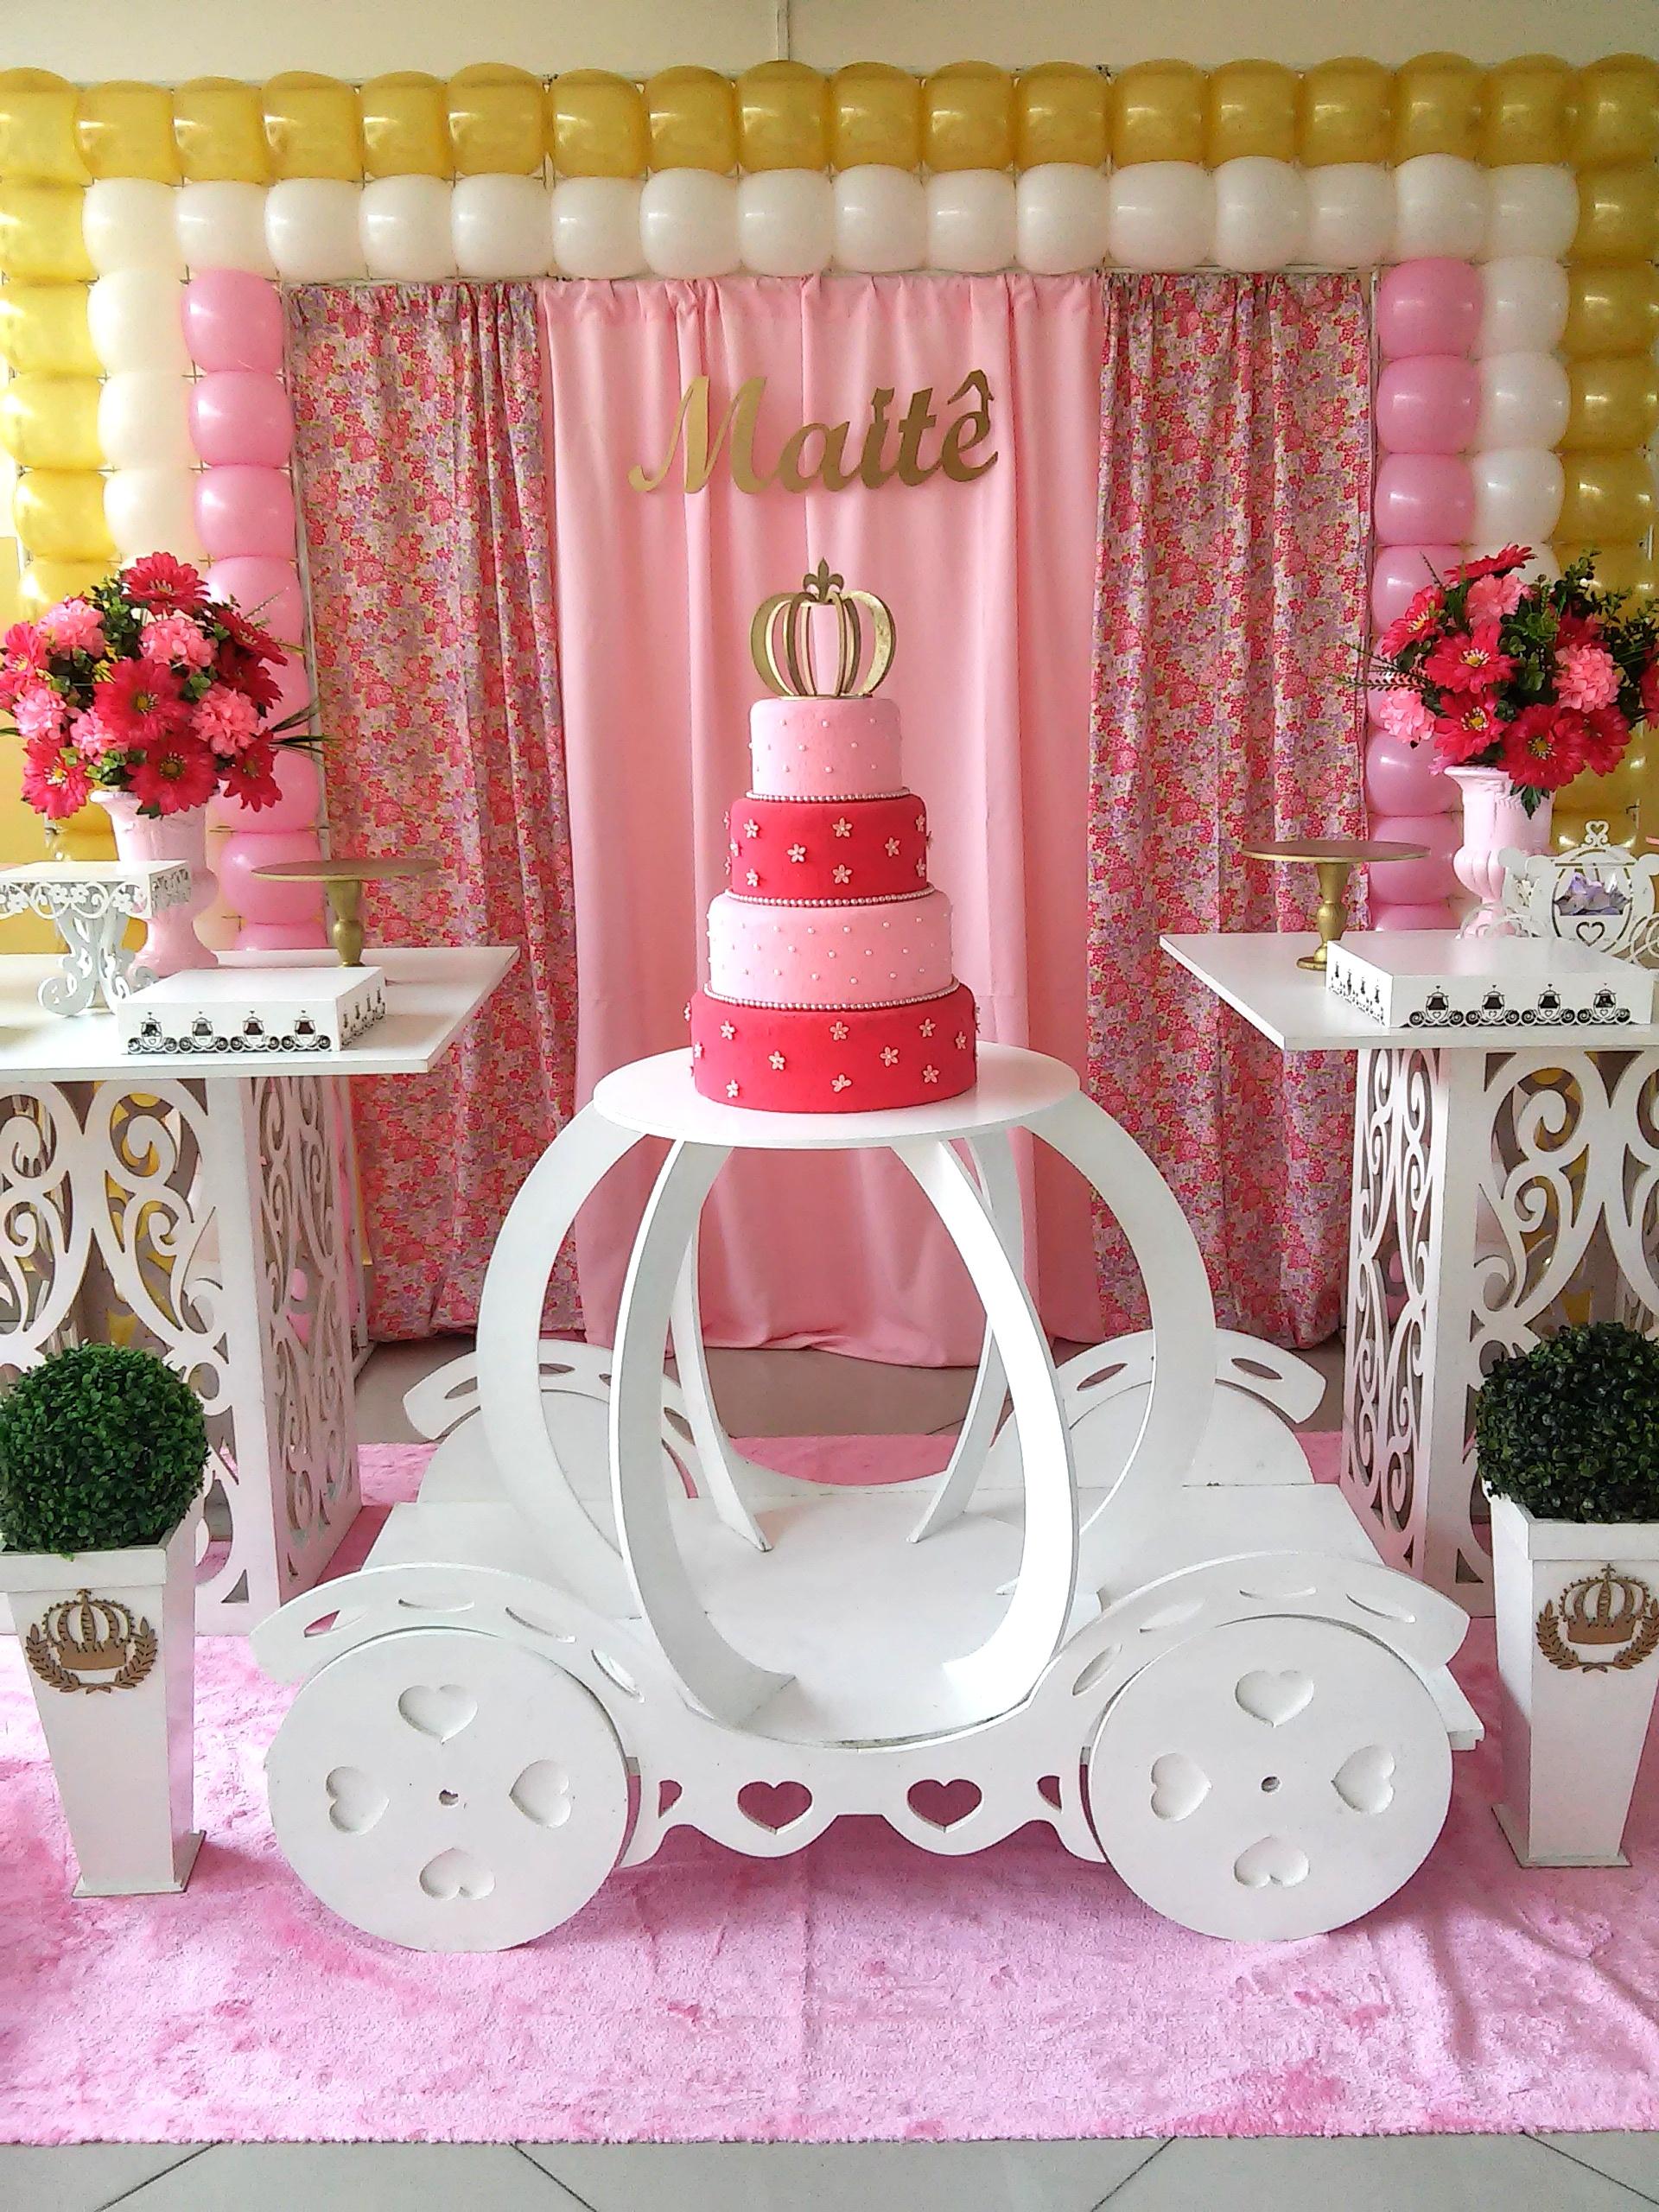 Decoraç u00e3o Festa Realeza Princesa Rede Festas Decorações Elo7 # Decoração De Festa Infantil Realeza Luxo